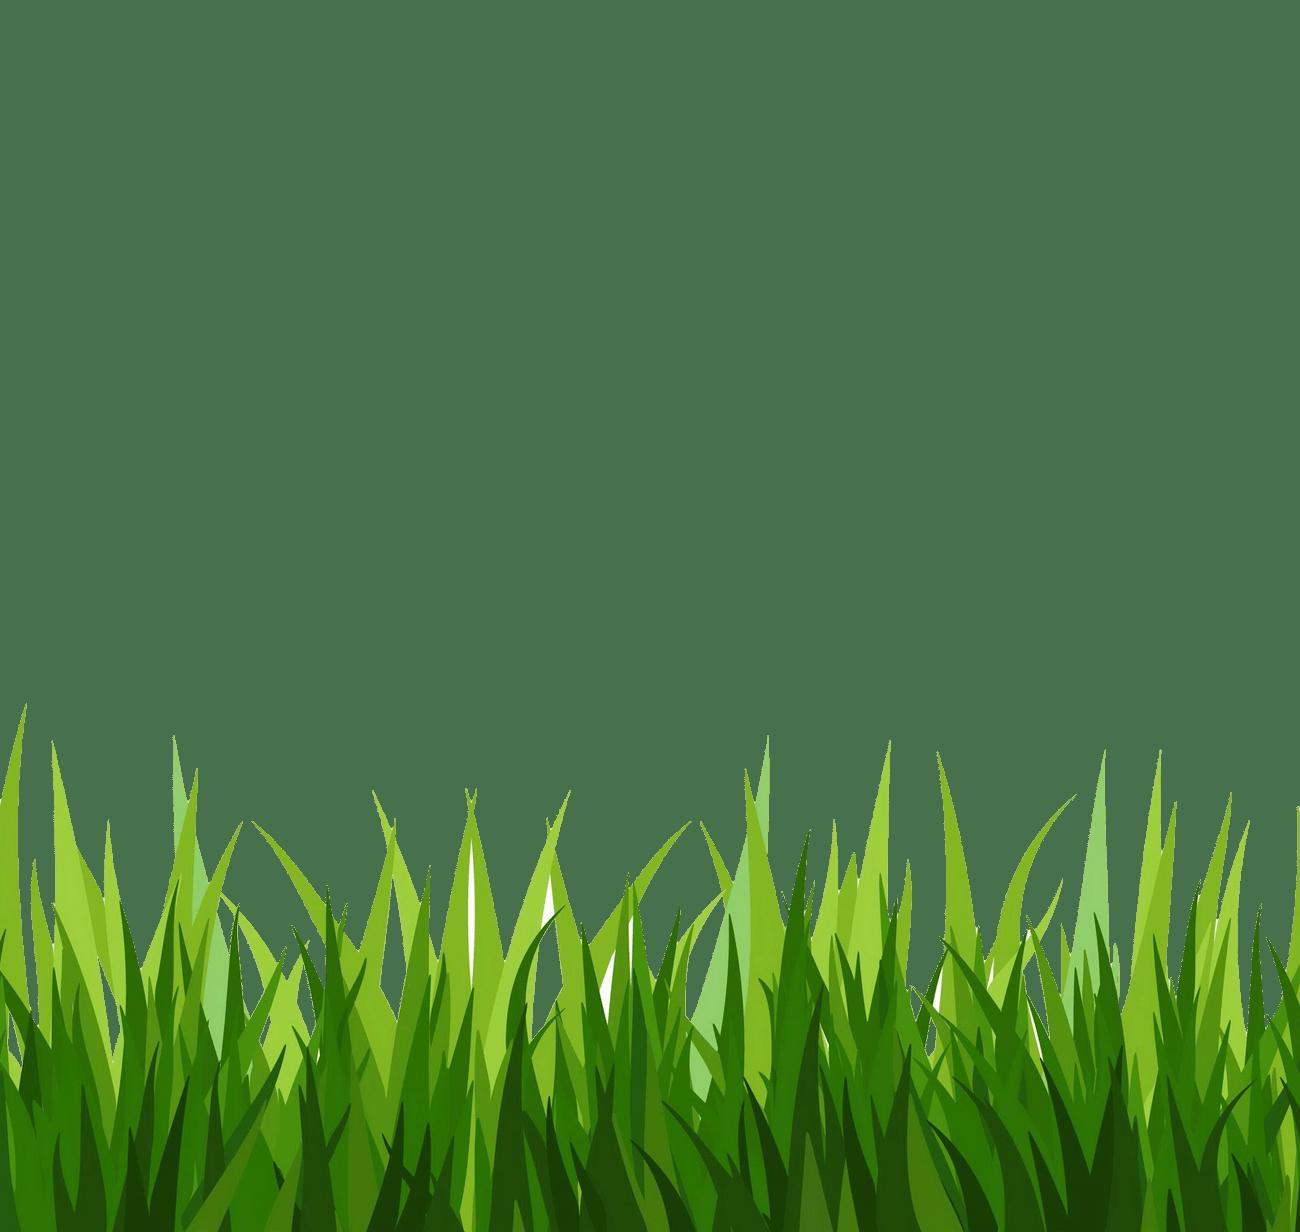 hight resolution of grass clipart 3